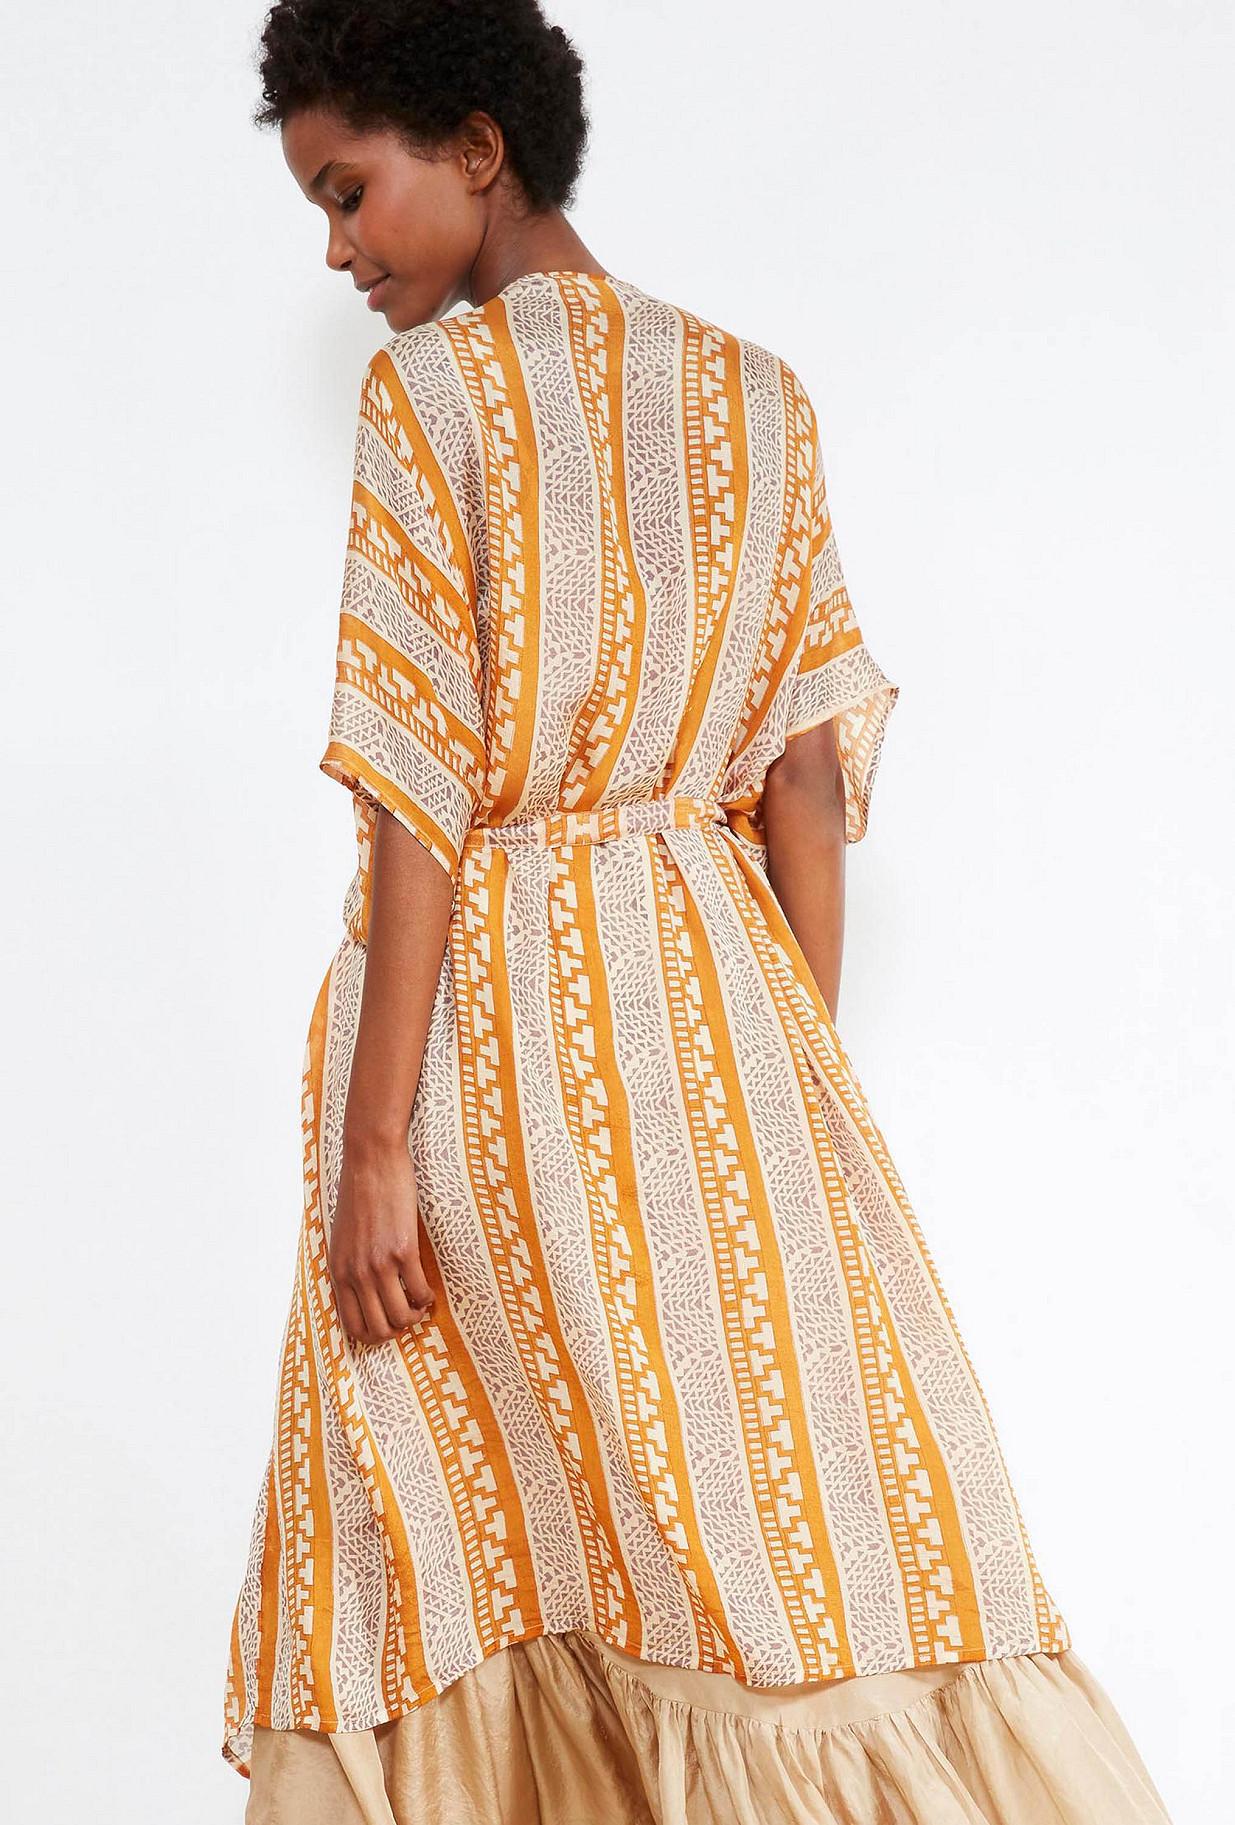 boutique de vetement KIMONO createur boheme  Swahili